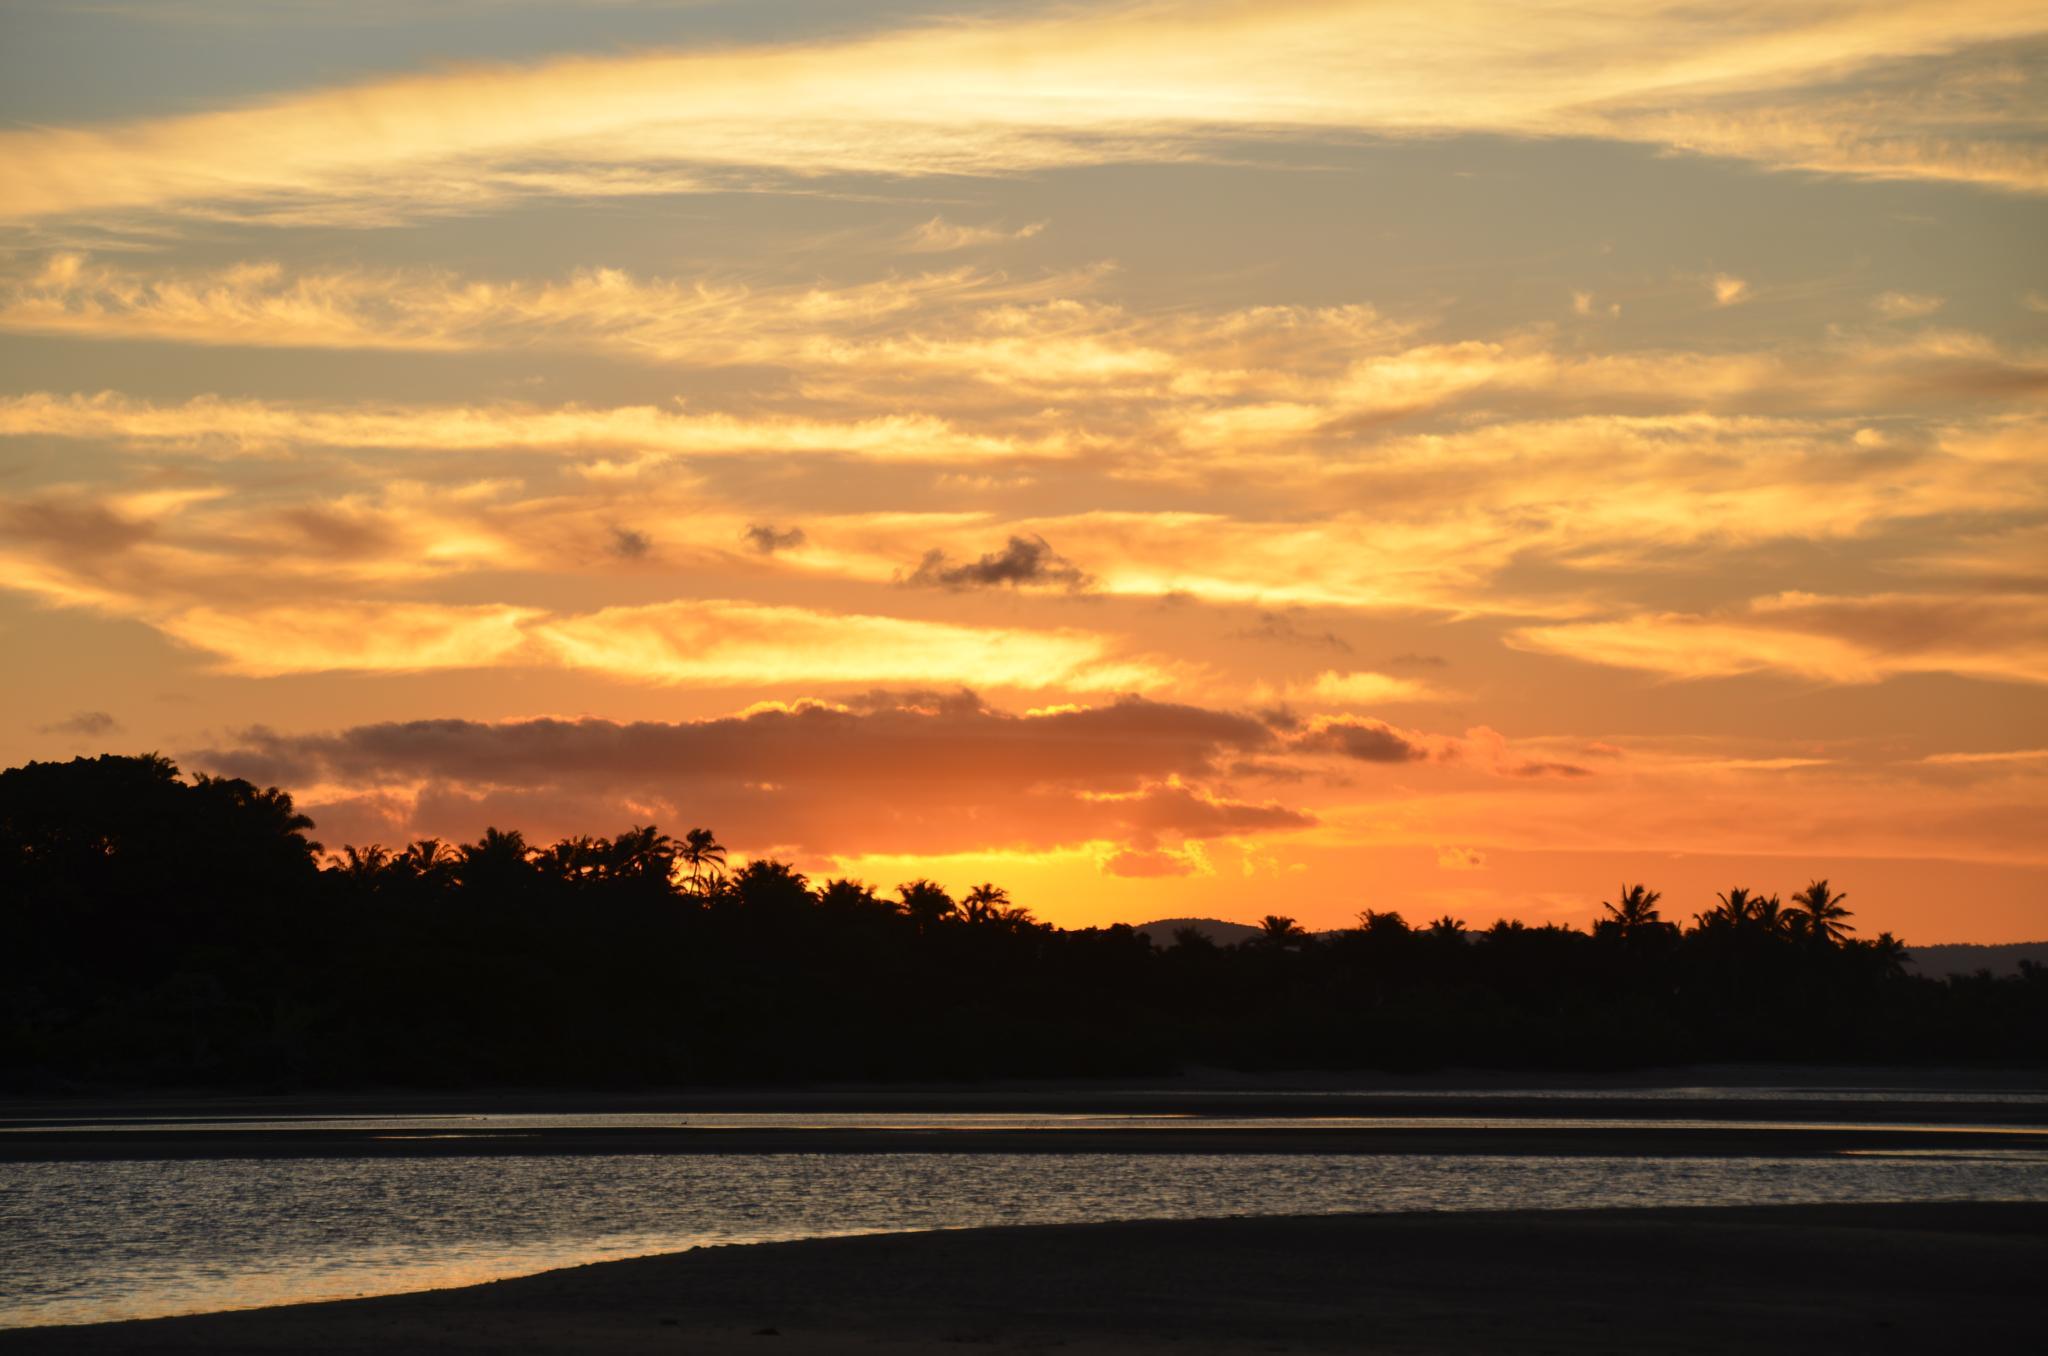 Sunset on the river Carapitangui by ClaudioBezerra